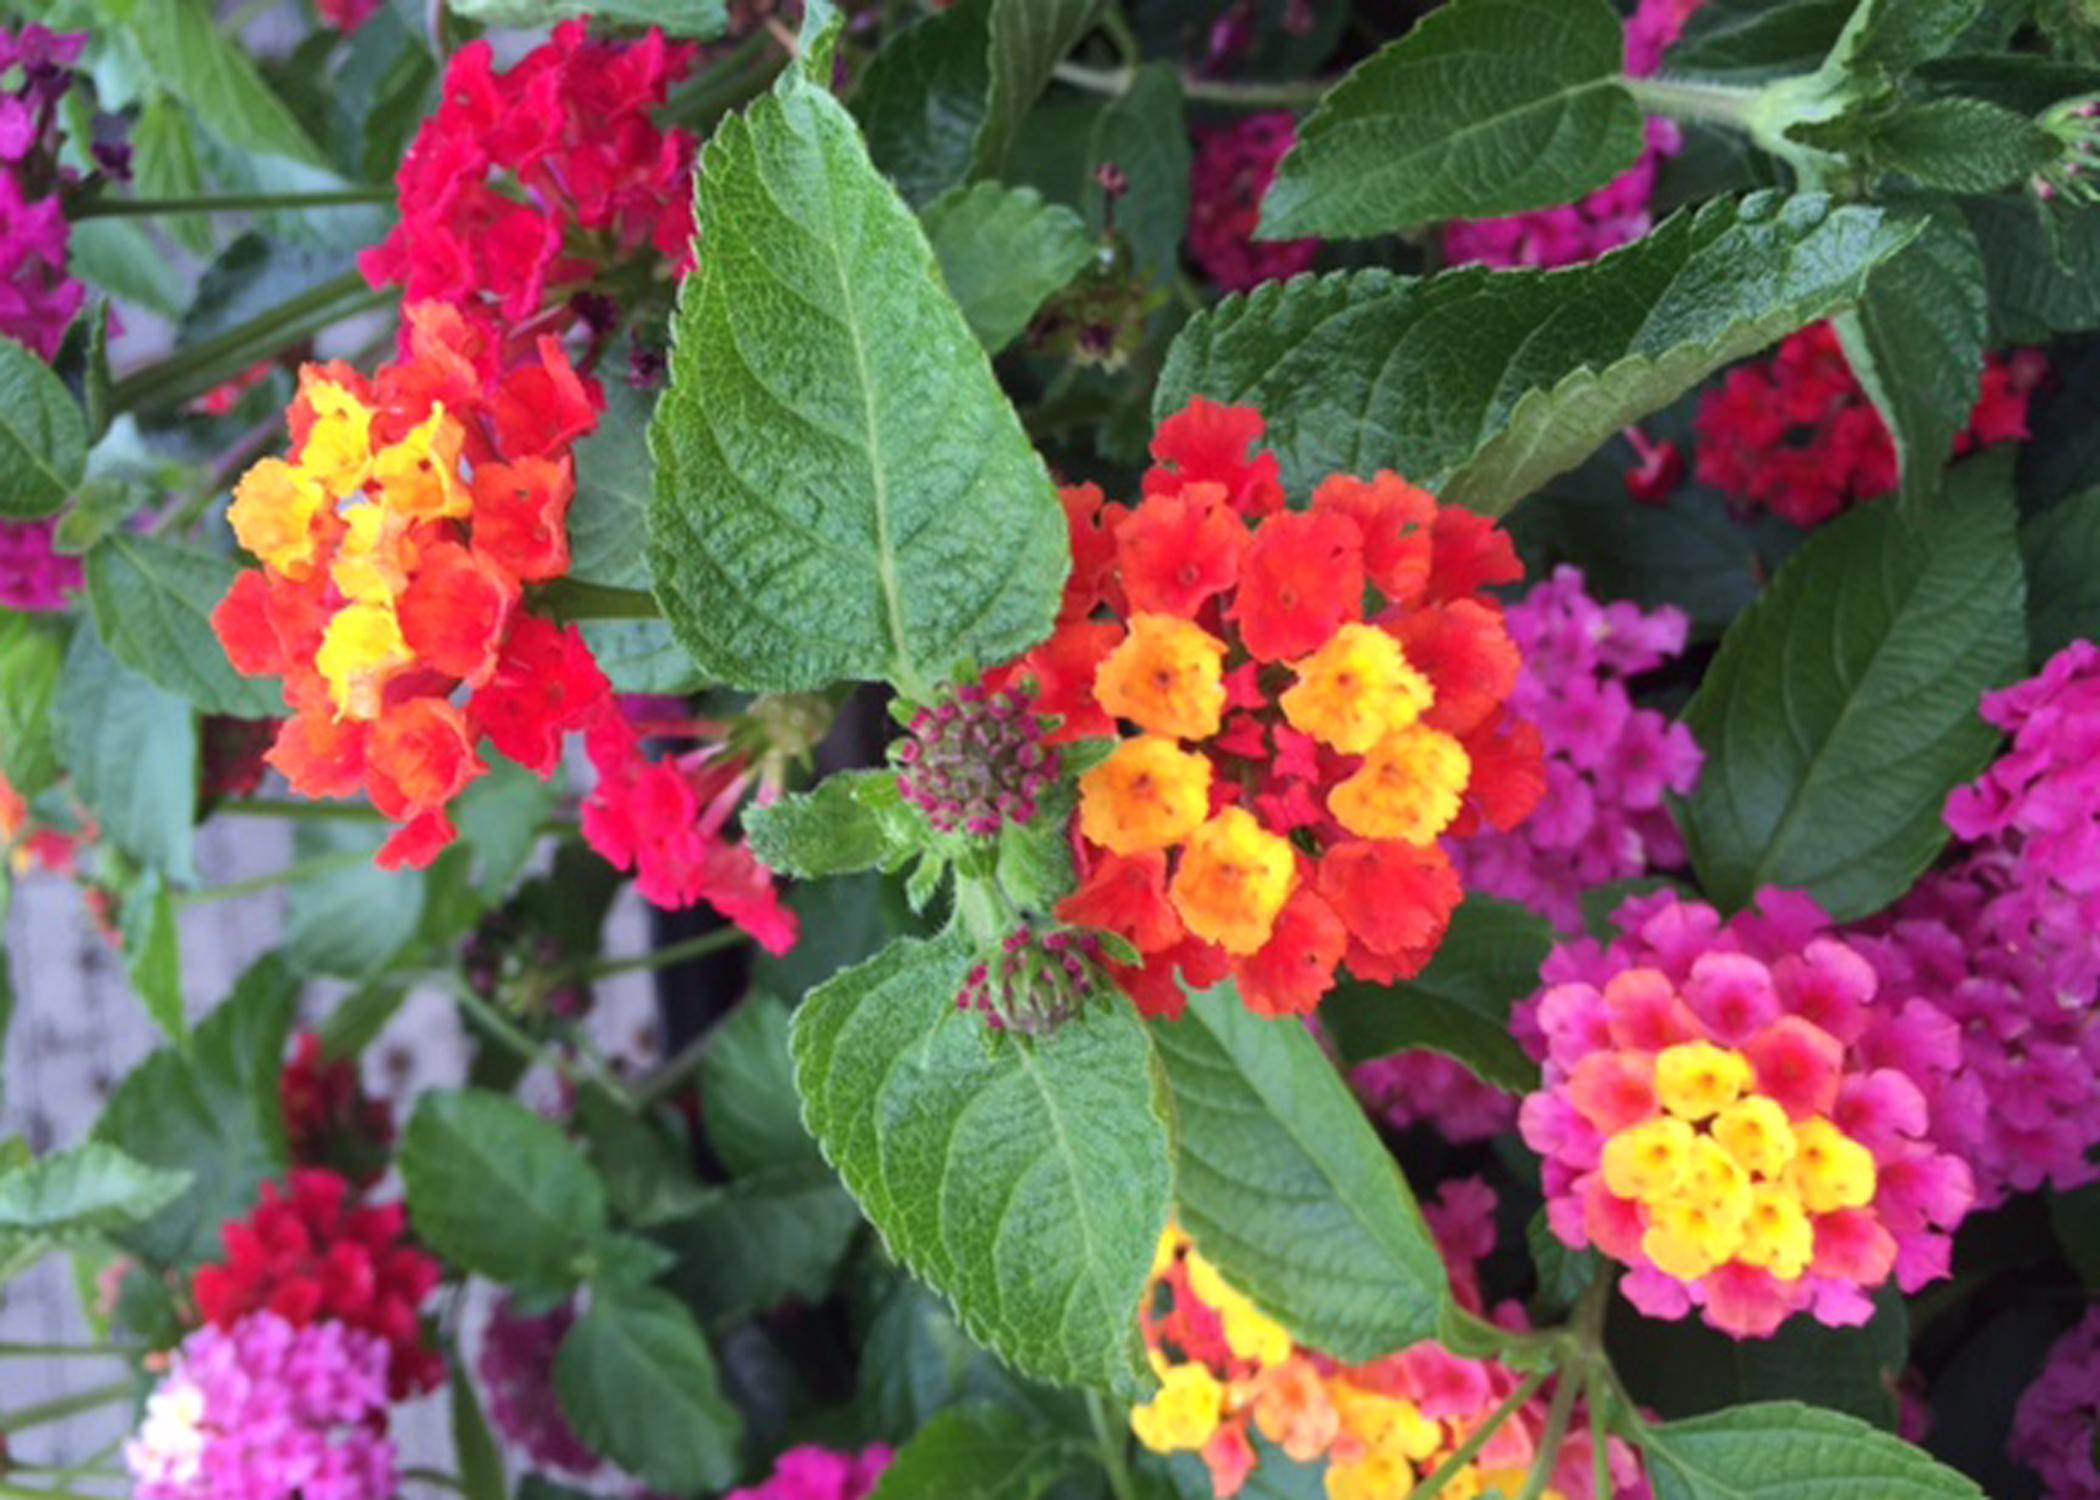 Interest heats up in tender perennials